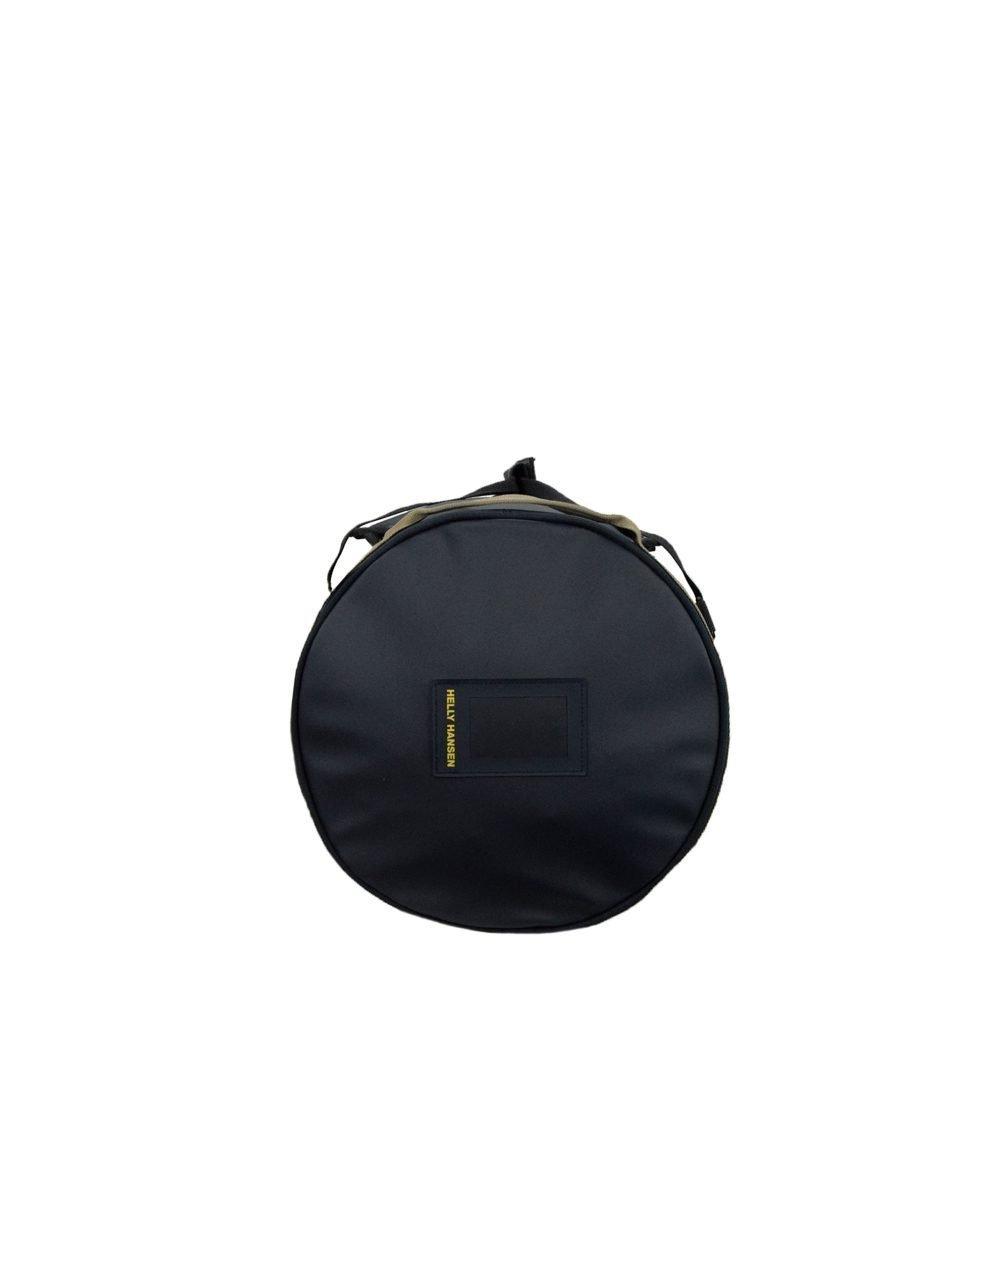 Helly Hansen Duffel Bag 50L (68005-995) Graphitte Blue